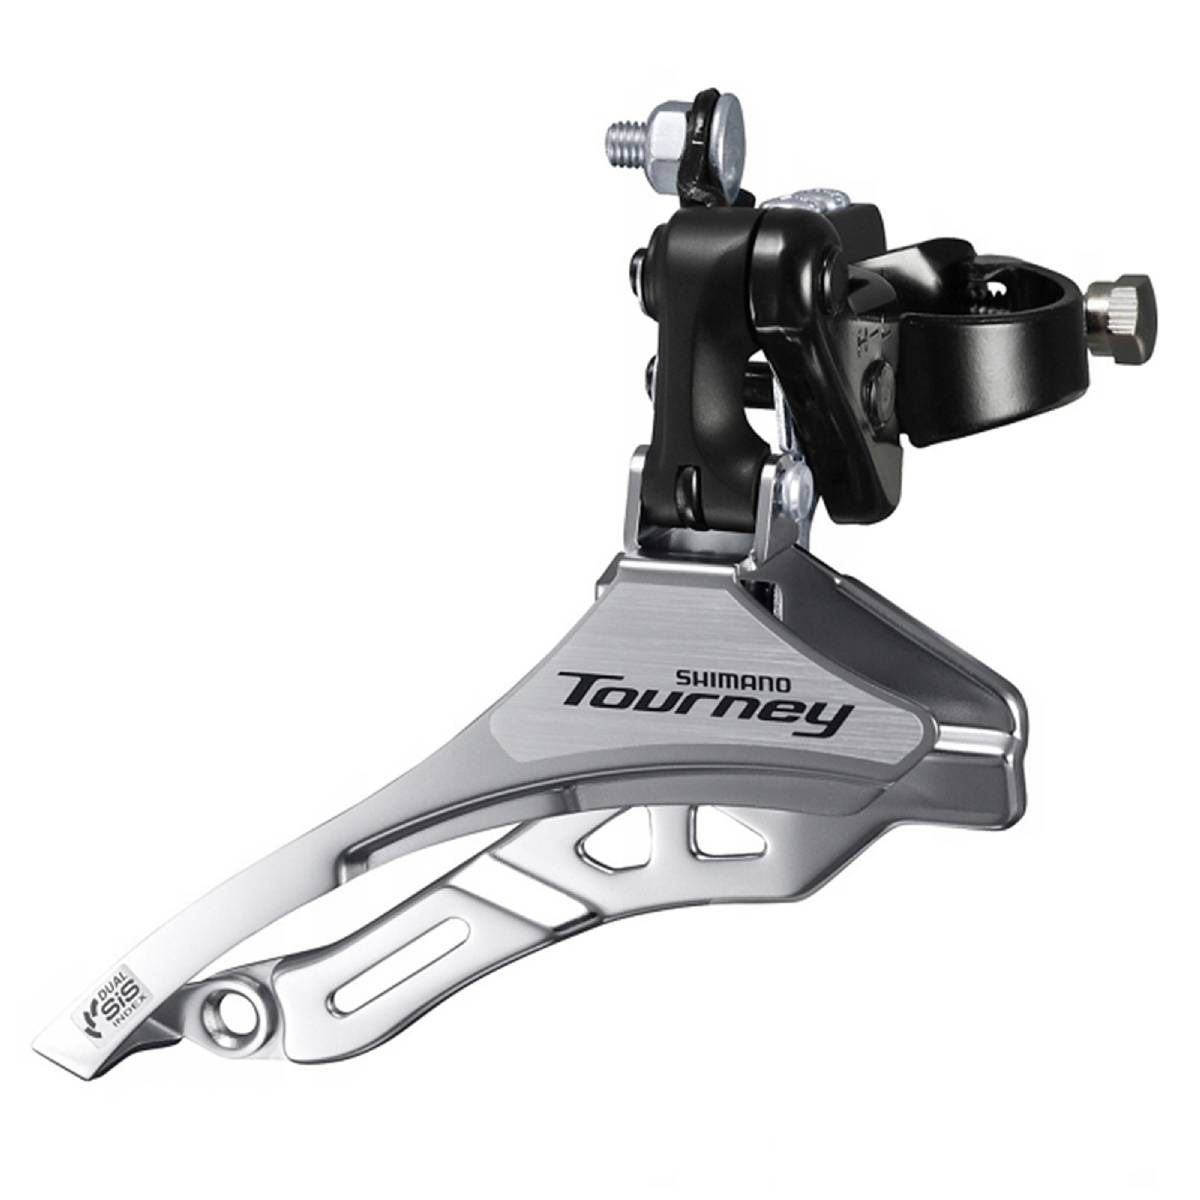 Shimano, Tourney FD-TY500, Dérailleur avant, 6/7vit., Top Swing, dual Pull, Low, 34.9/31.8/28.6mm